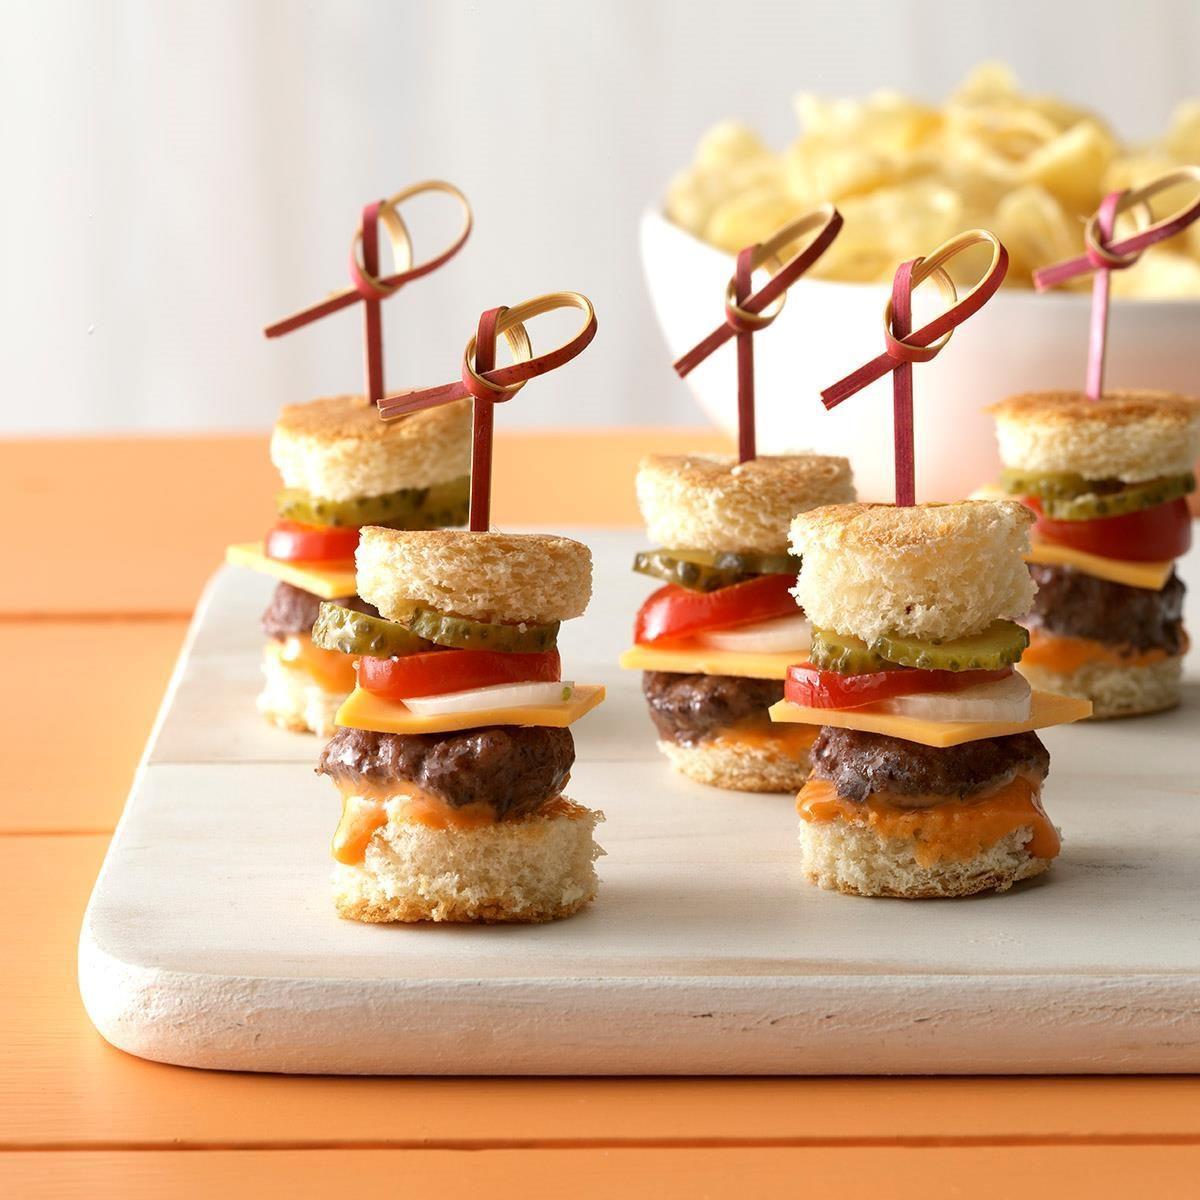 70 birthday food ideas